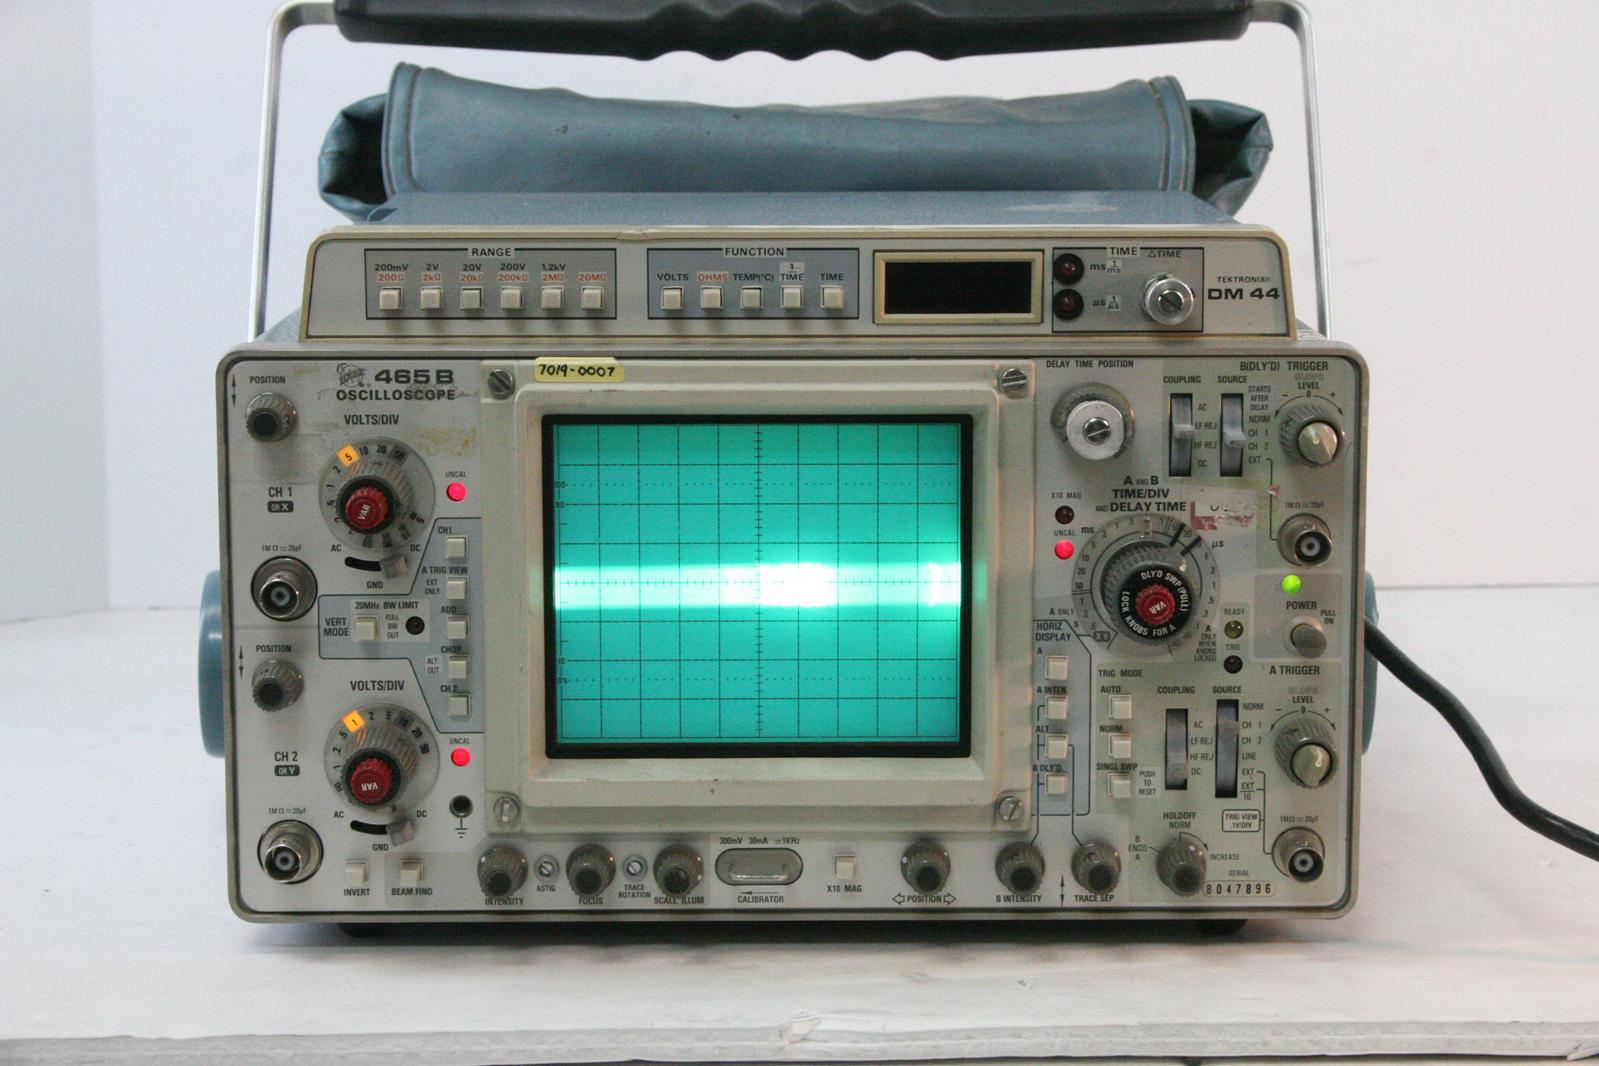 TEKTRONIX 465B Oscilloscope with DM44 Multimeter